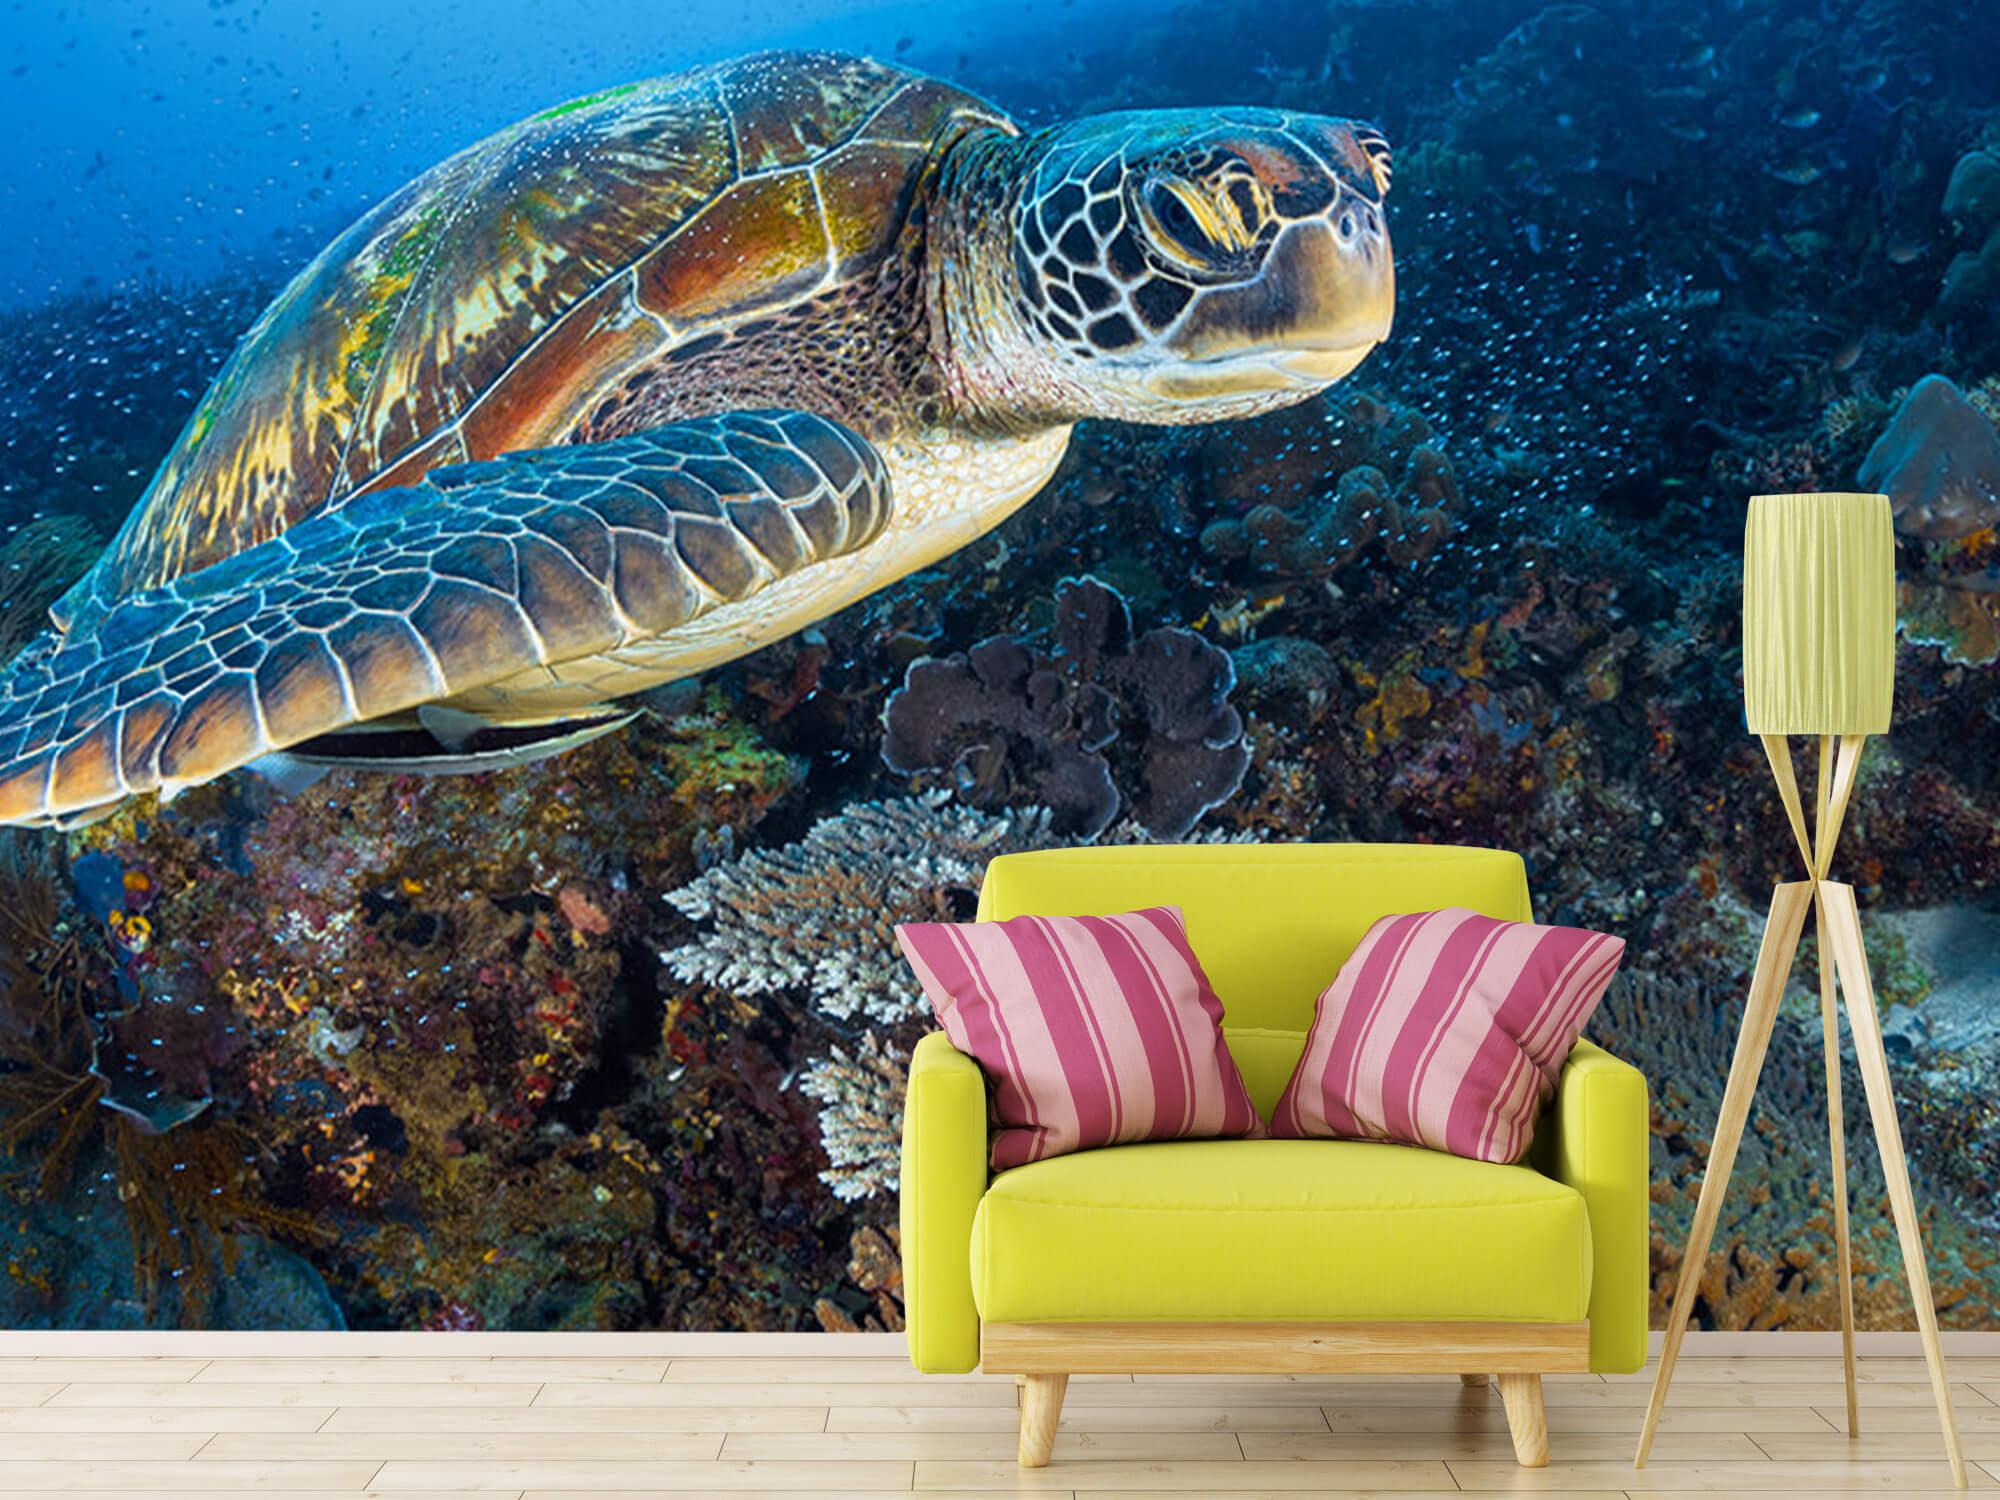 Green sea turtle from Raja Ampat 2